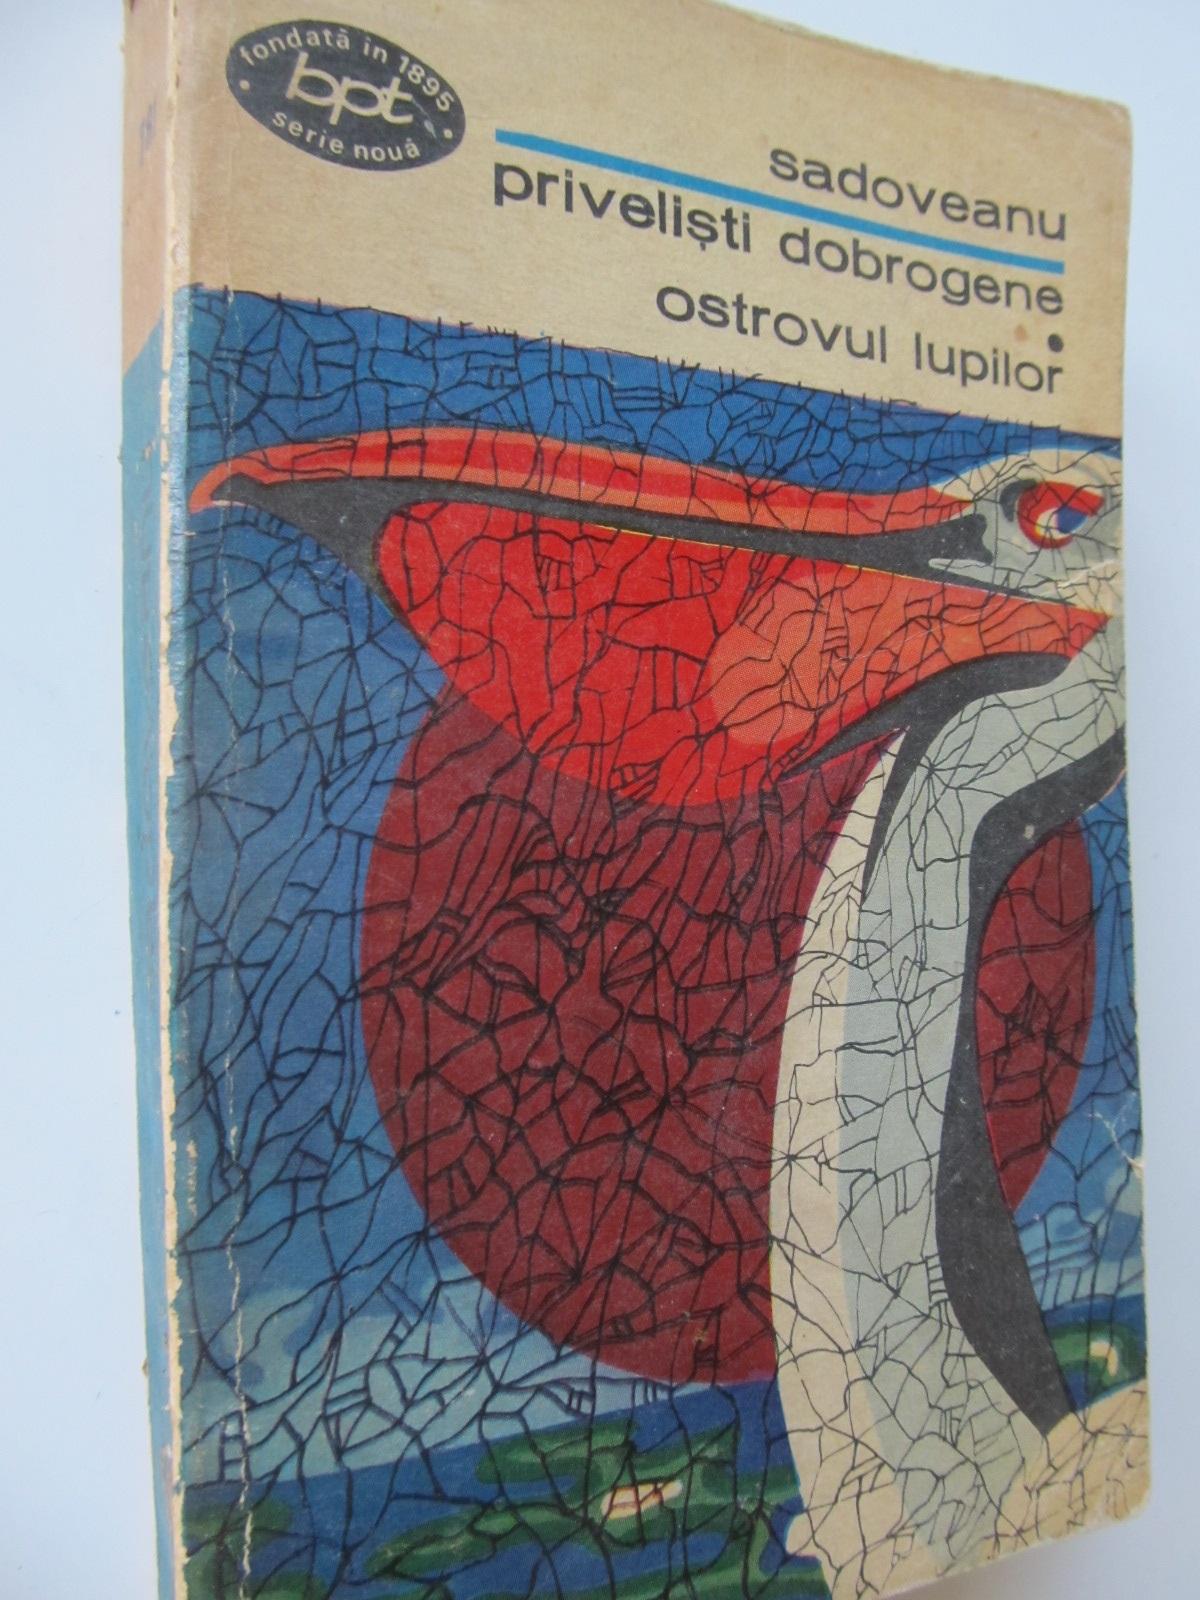 Privelisti dobrogene - Ostrovul lupilor - Mihail Sadoveanu | Detalii carte